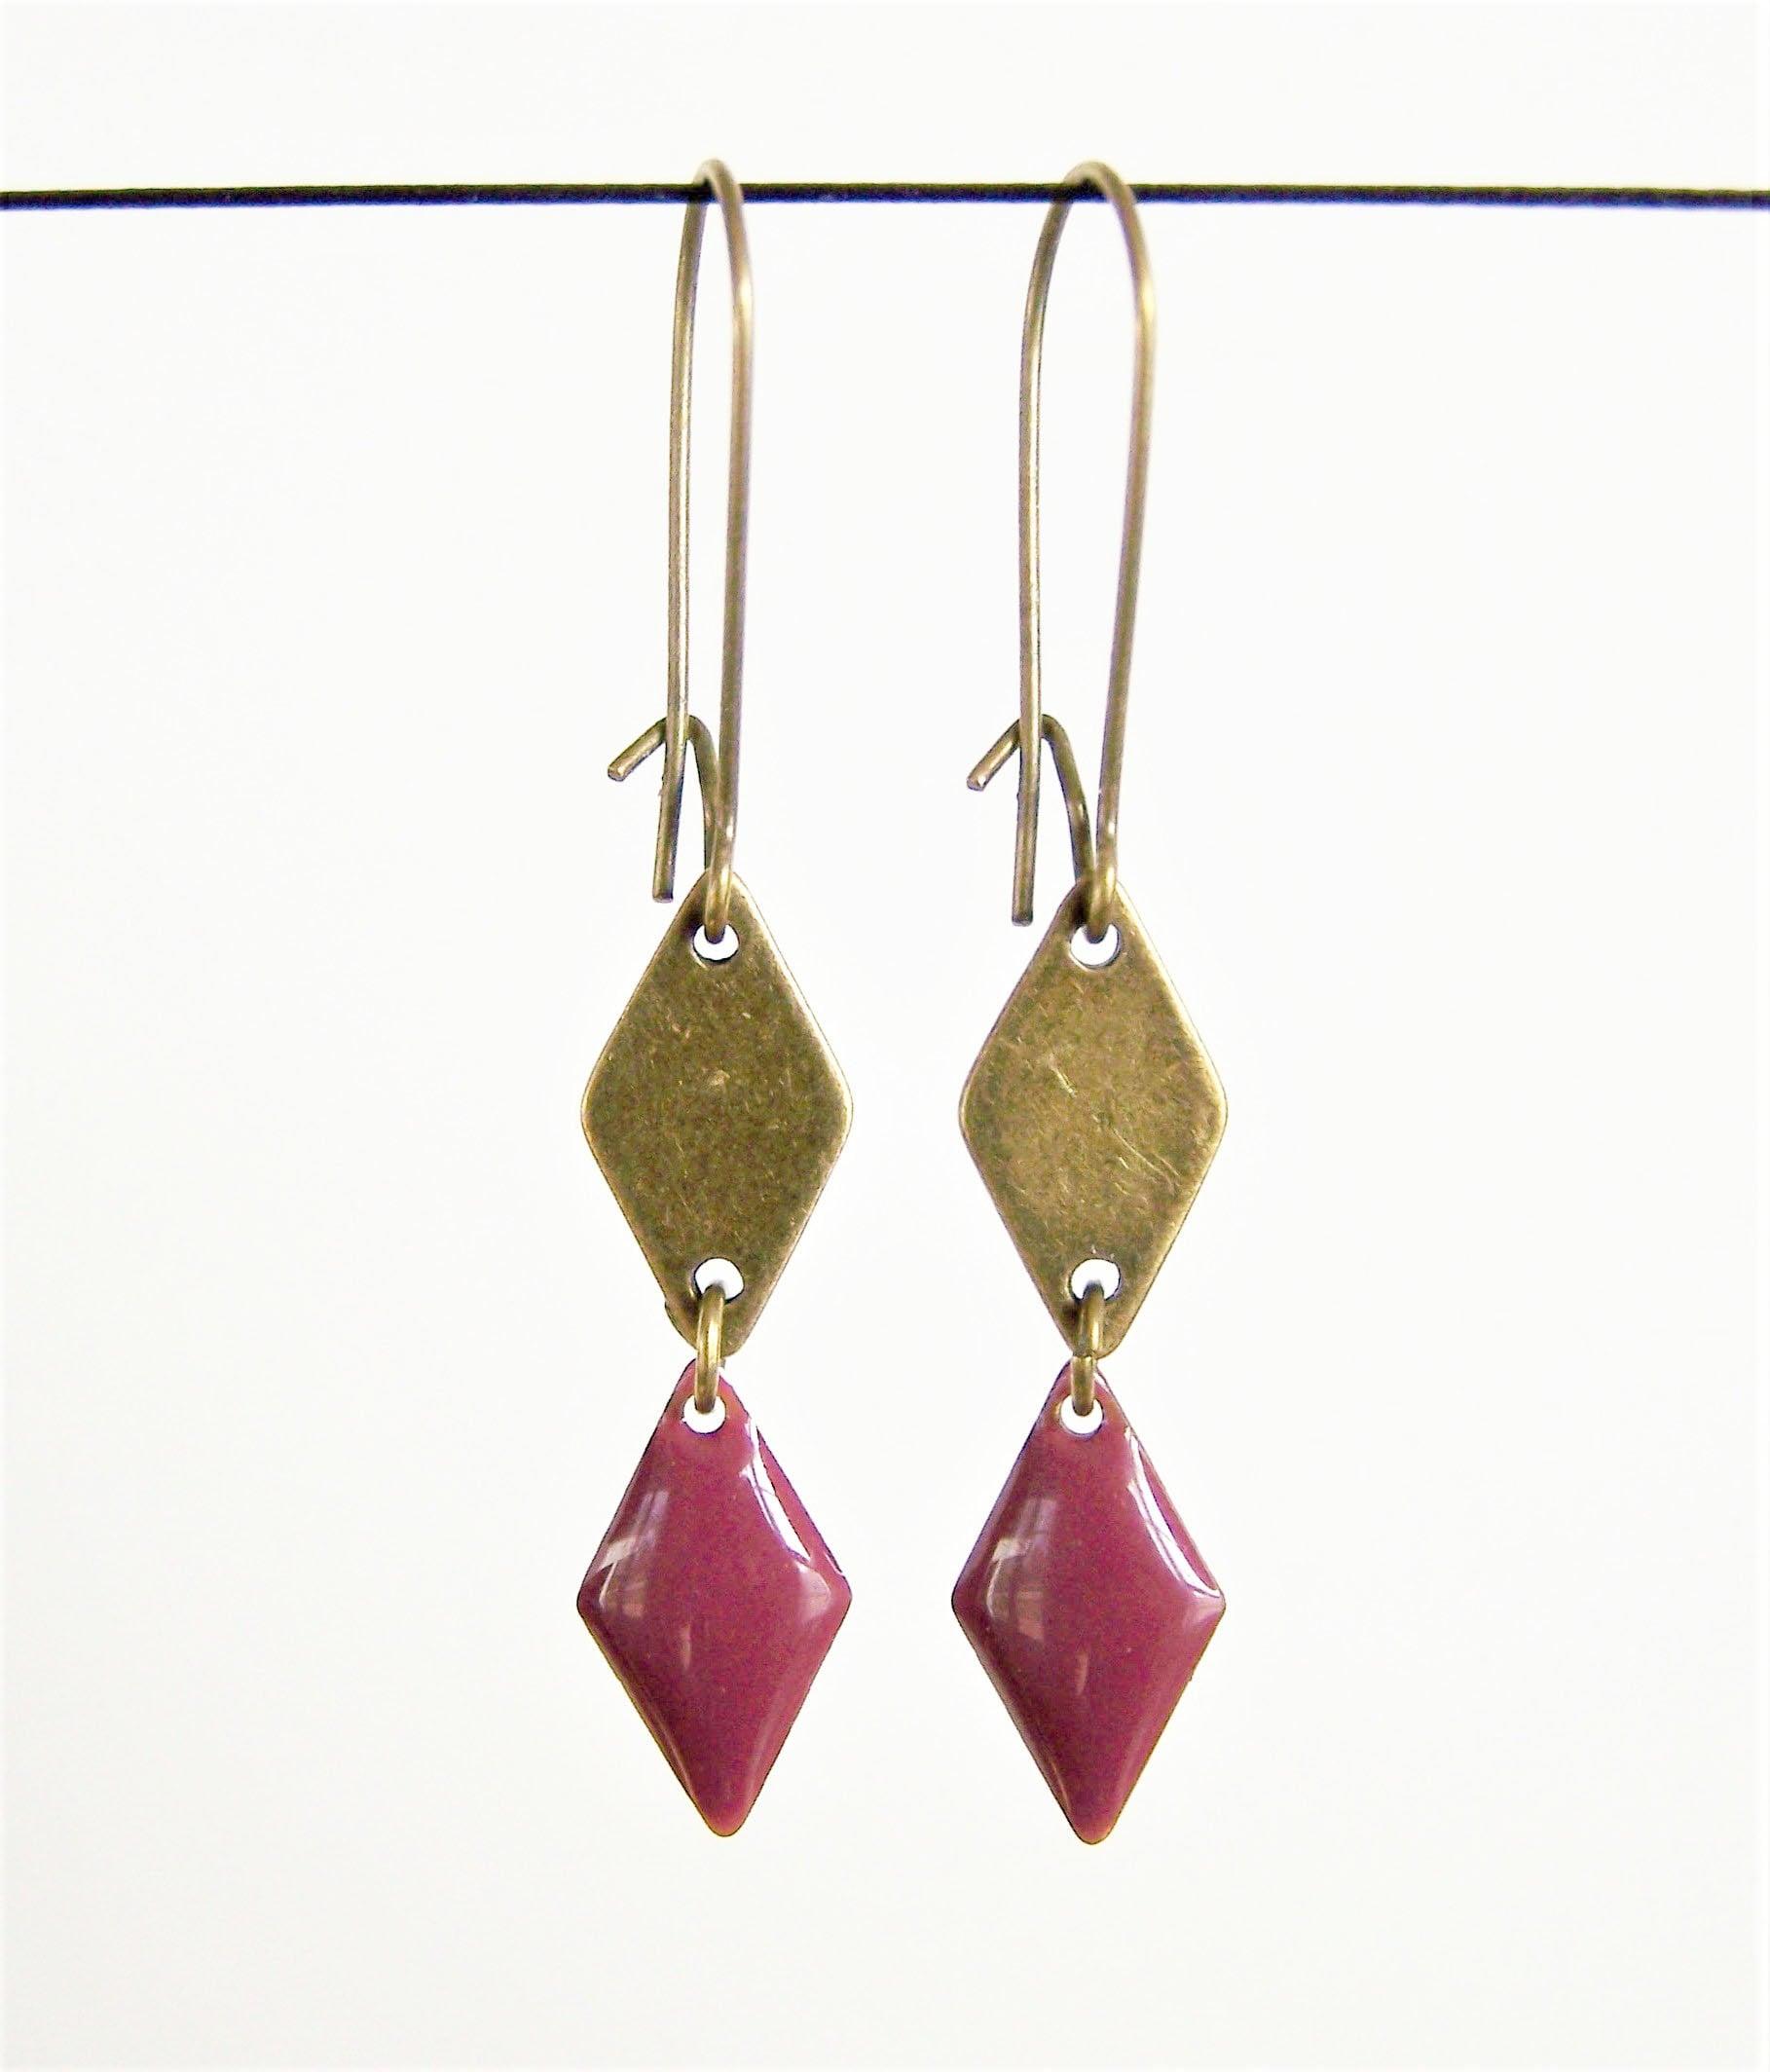 Brass diamond shape and raspberry purple enameled diamond